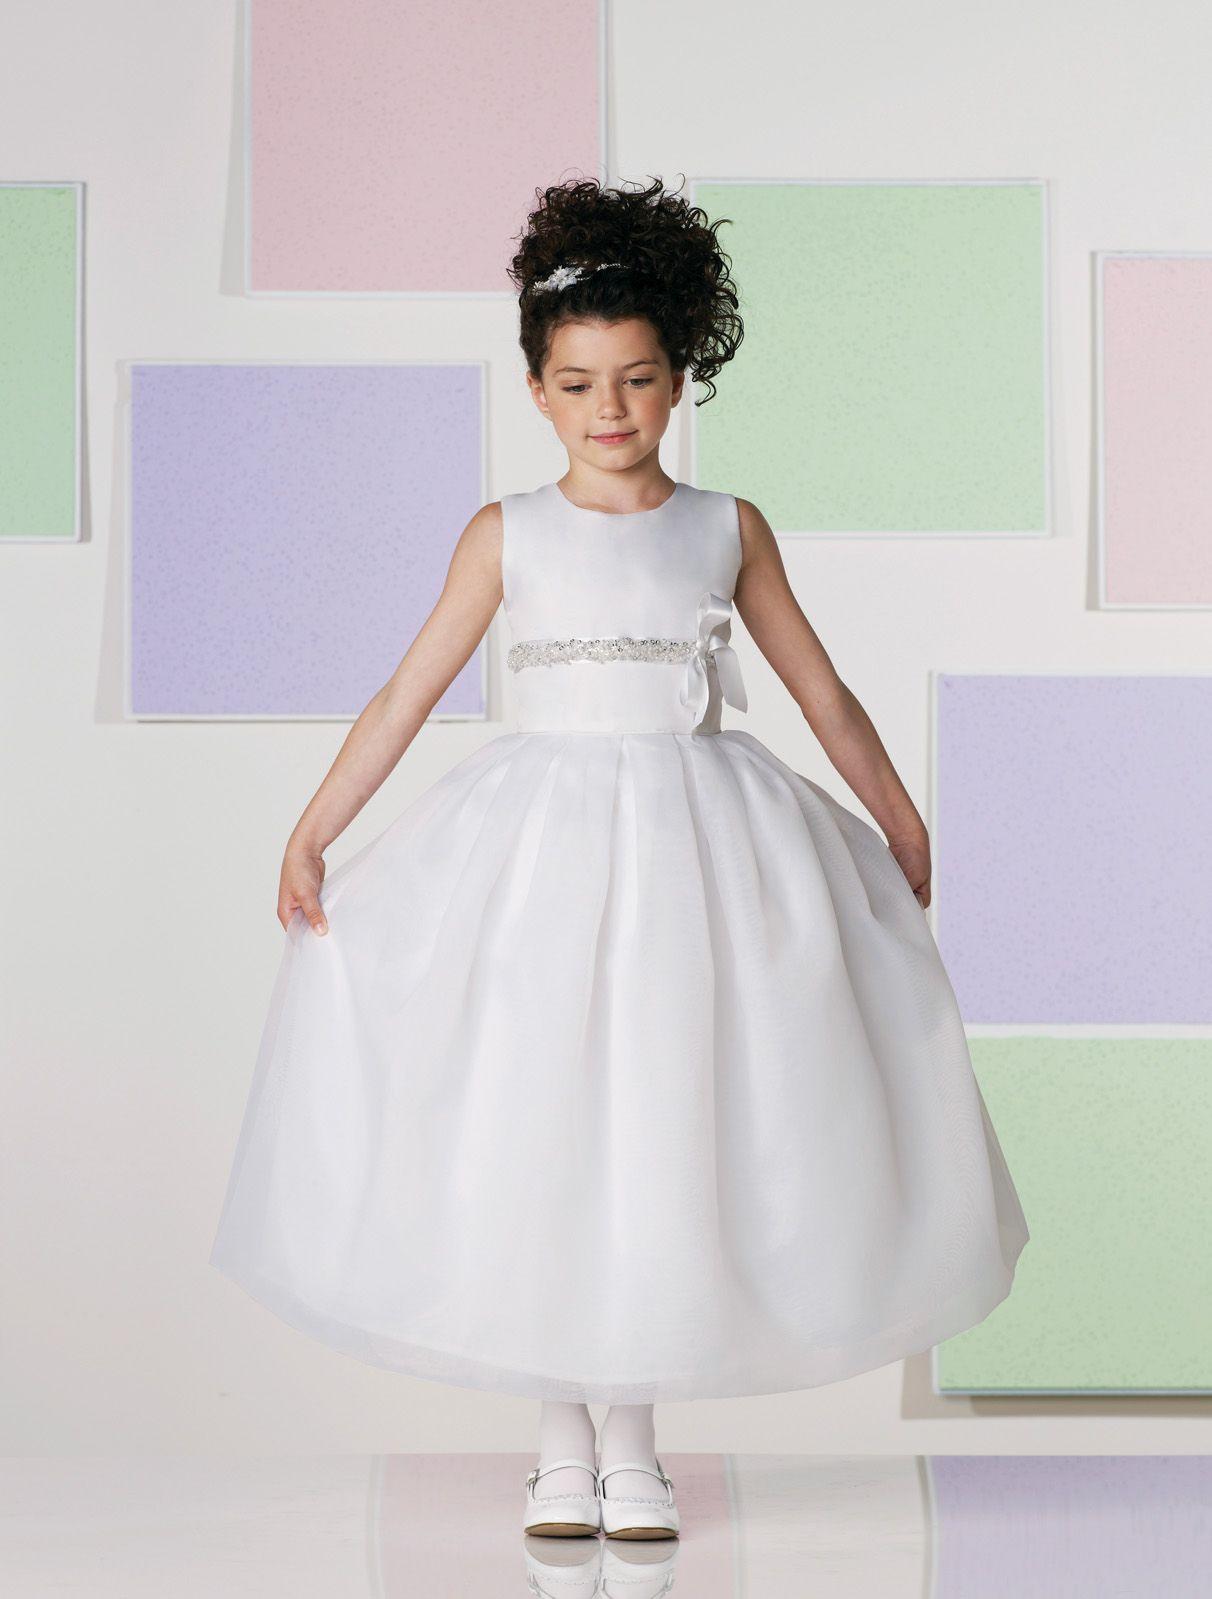 202f5db5d05 Sleeveless satin and organza tea-length A-line dress with jewel neckline